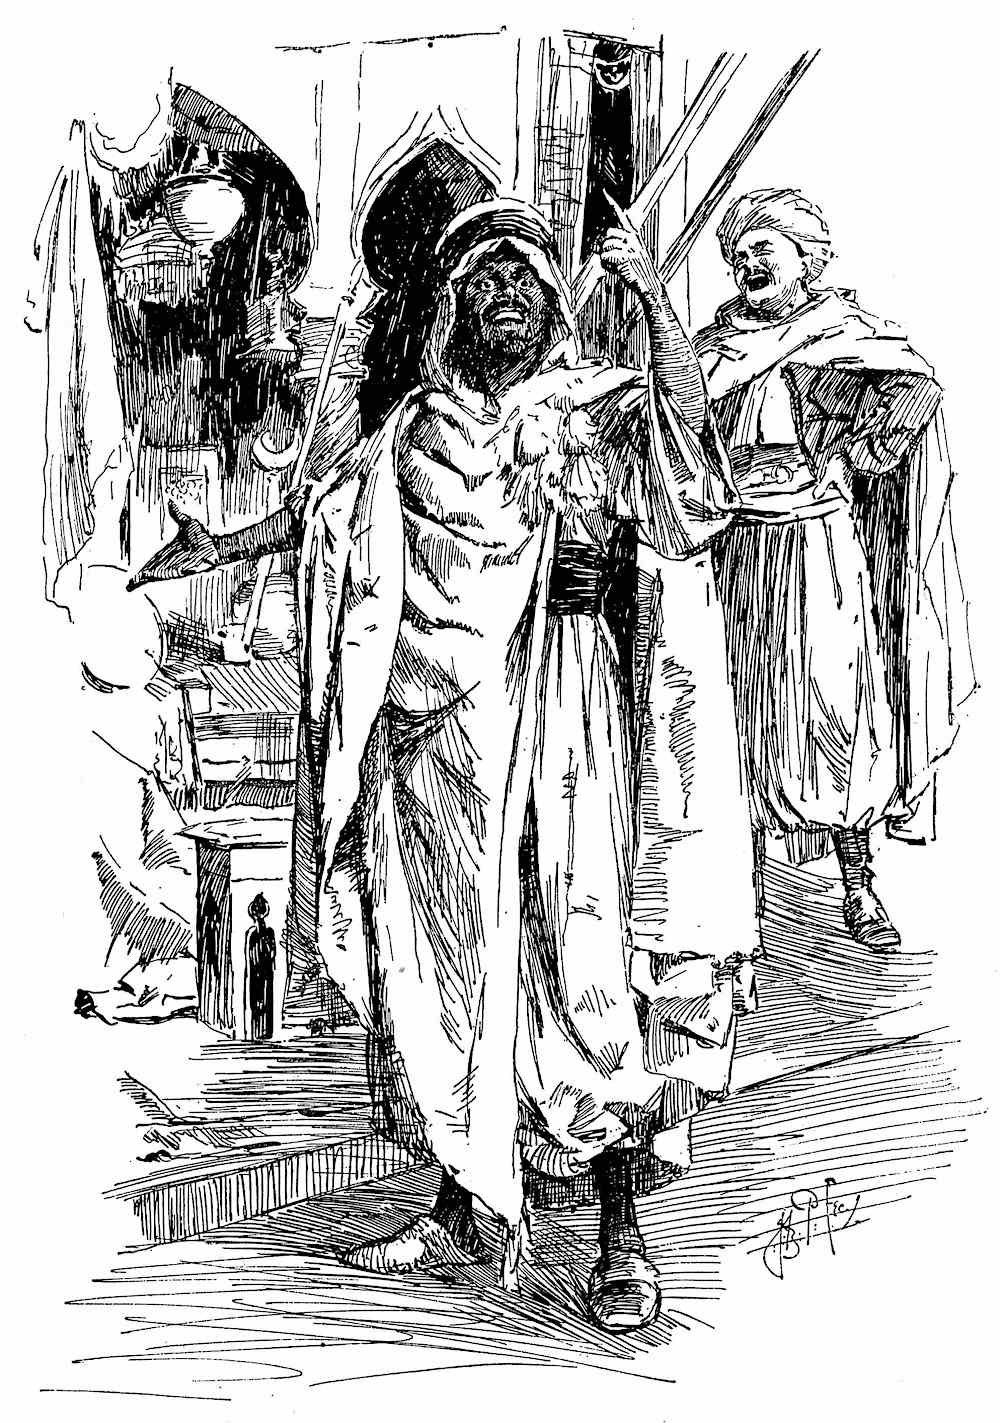 a J. Bernard Partridge illustration of a joking Arab merchant